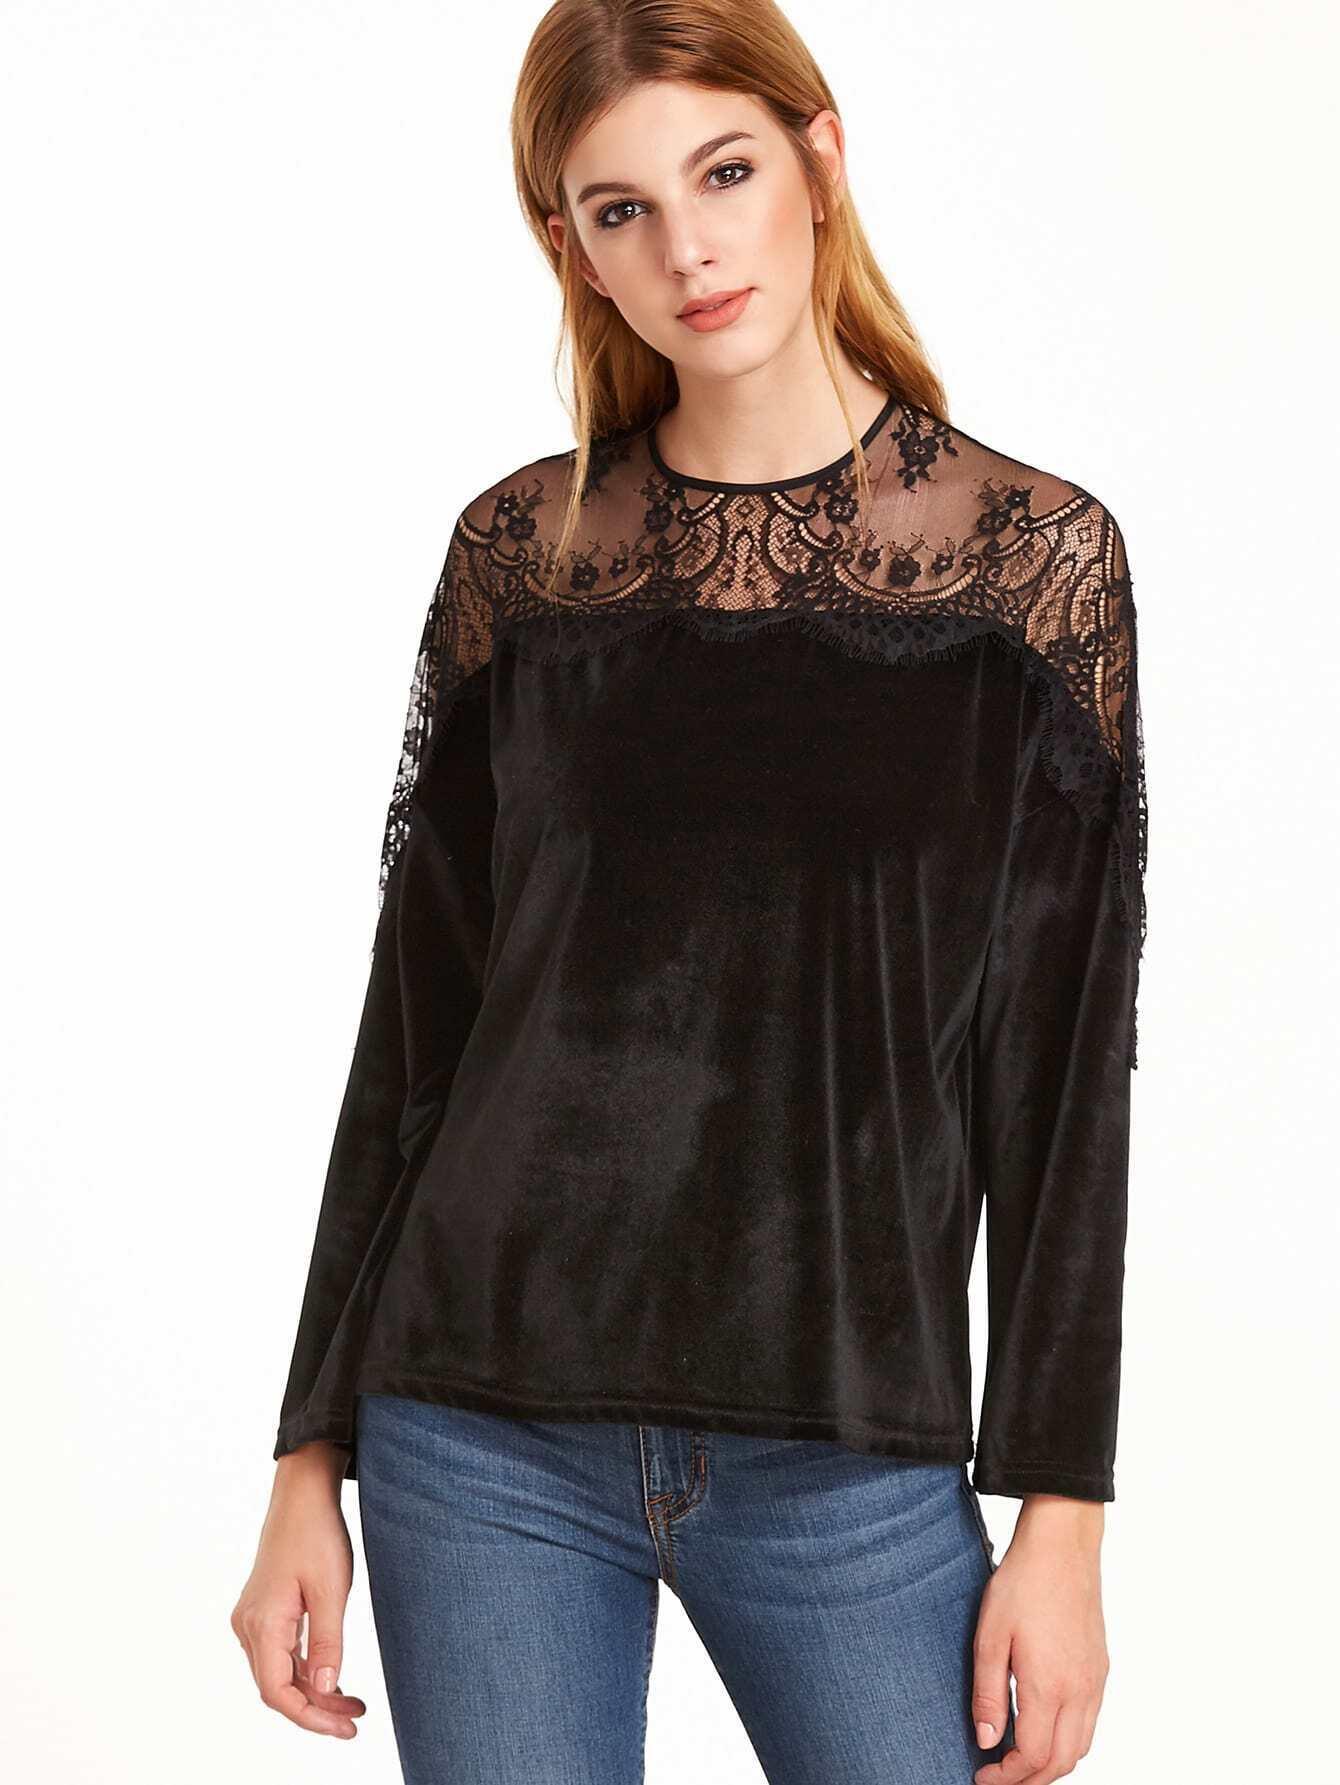 blouse161125707_2